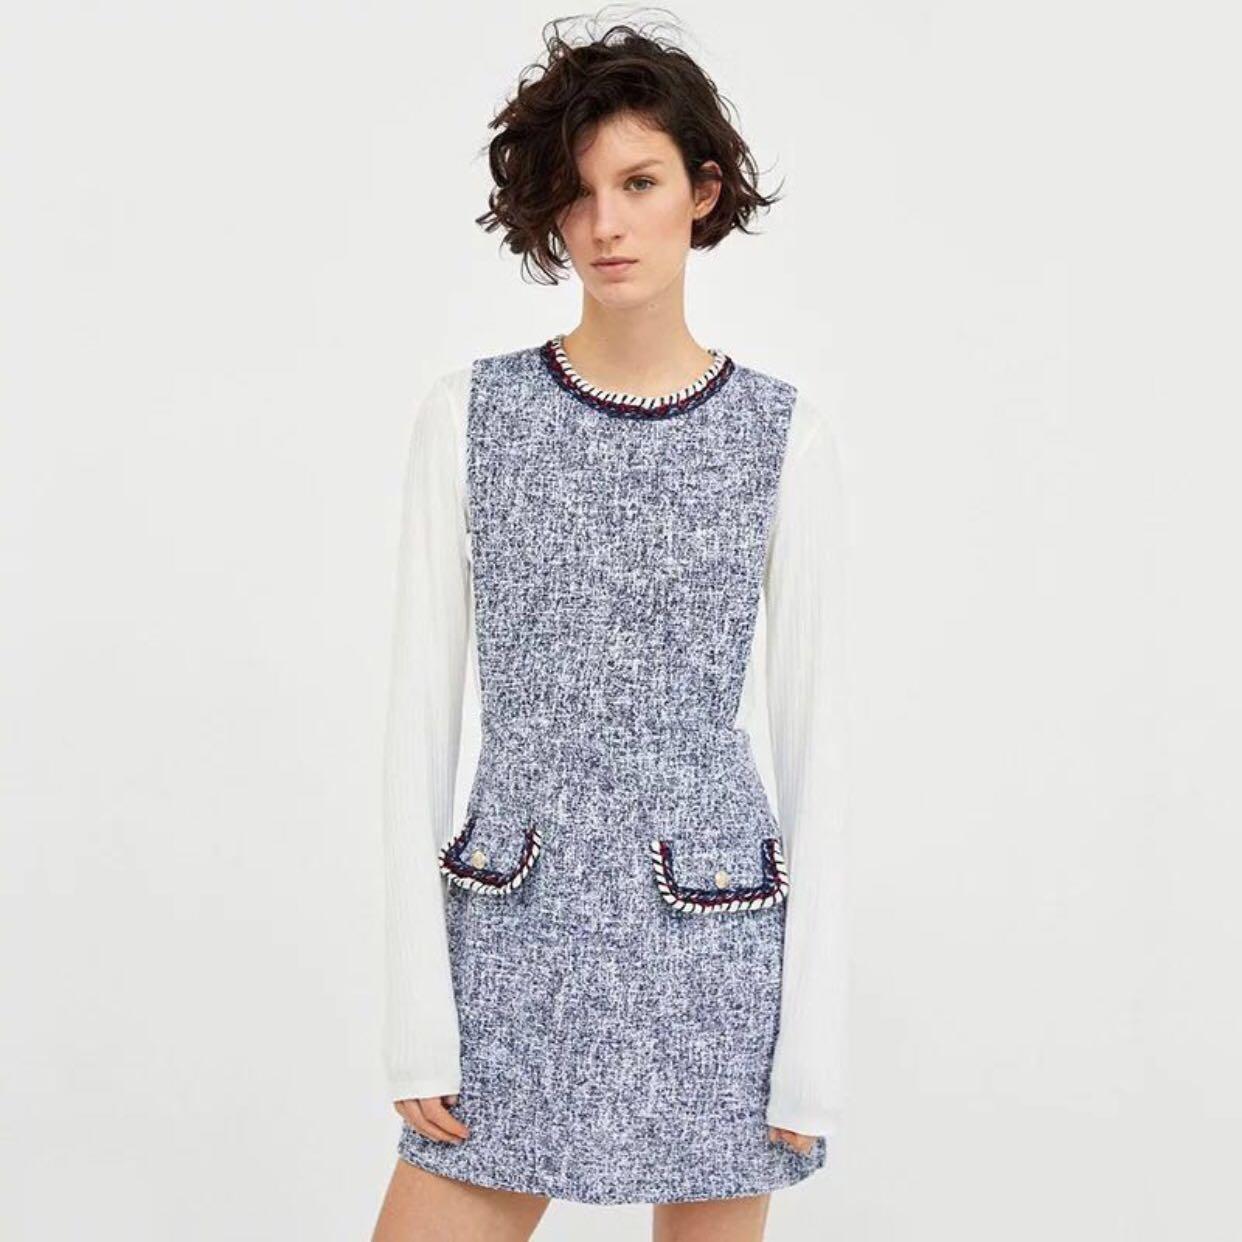 6eab4e39ef Zara Pinafore Dress Size S